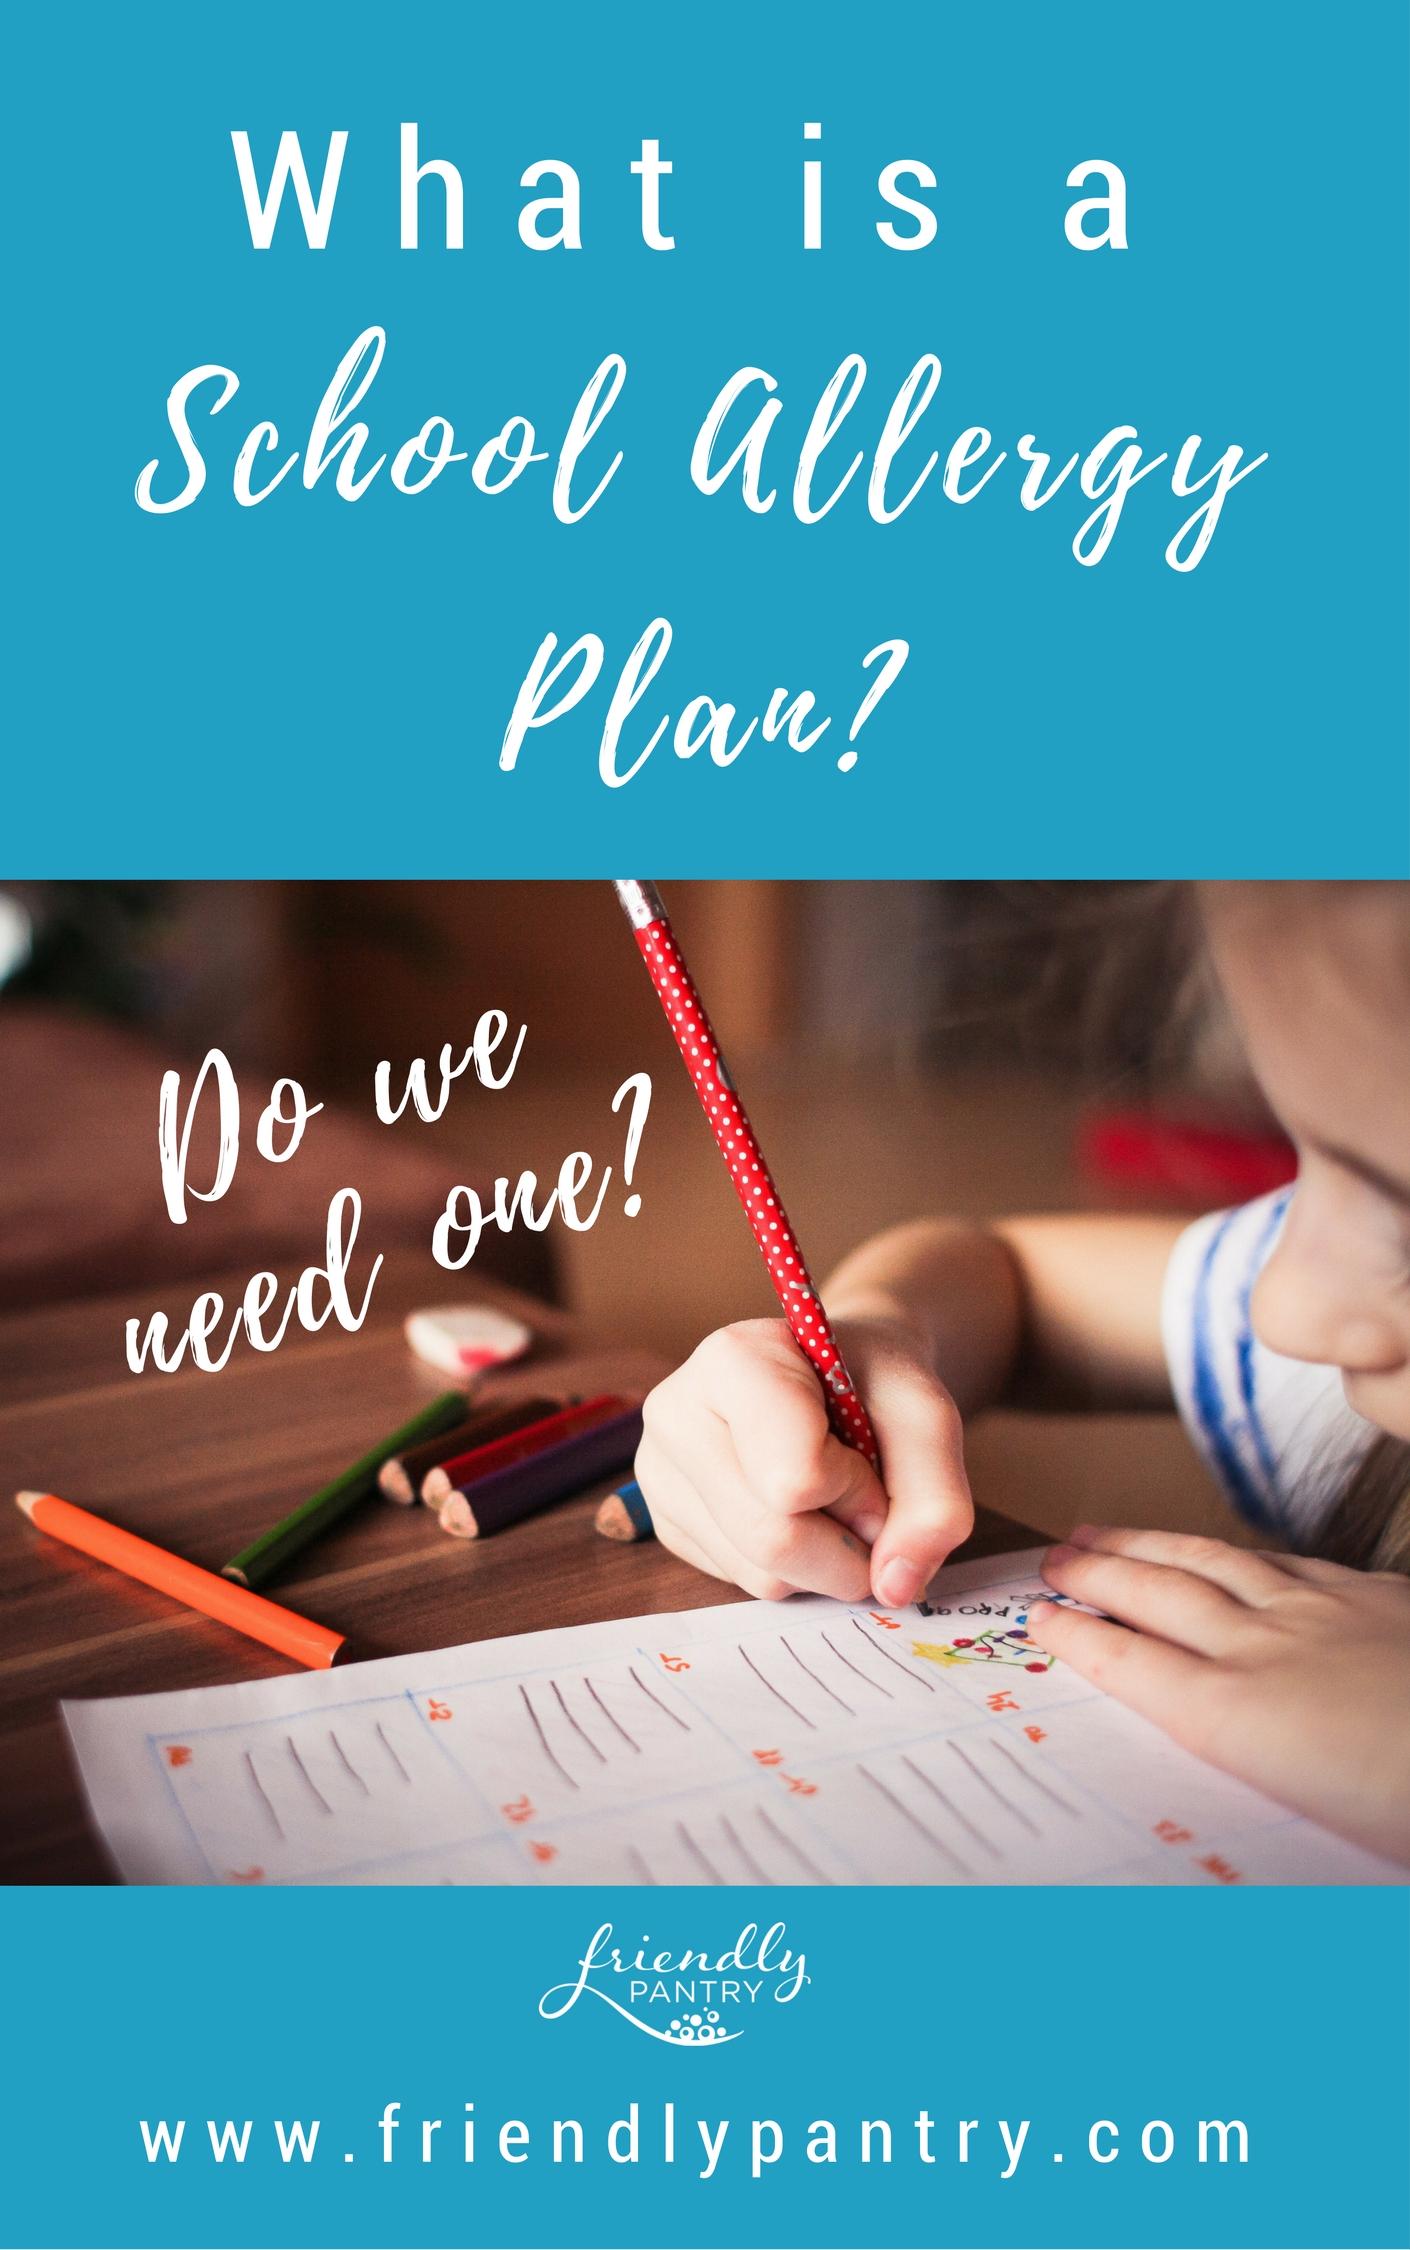 Food allergies and school